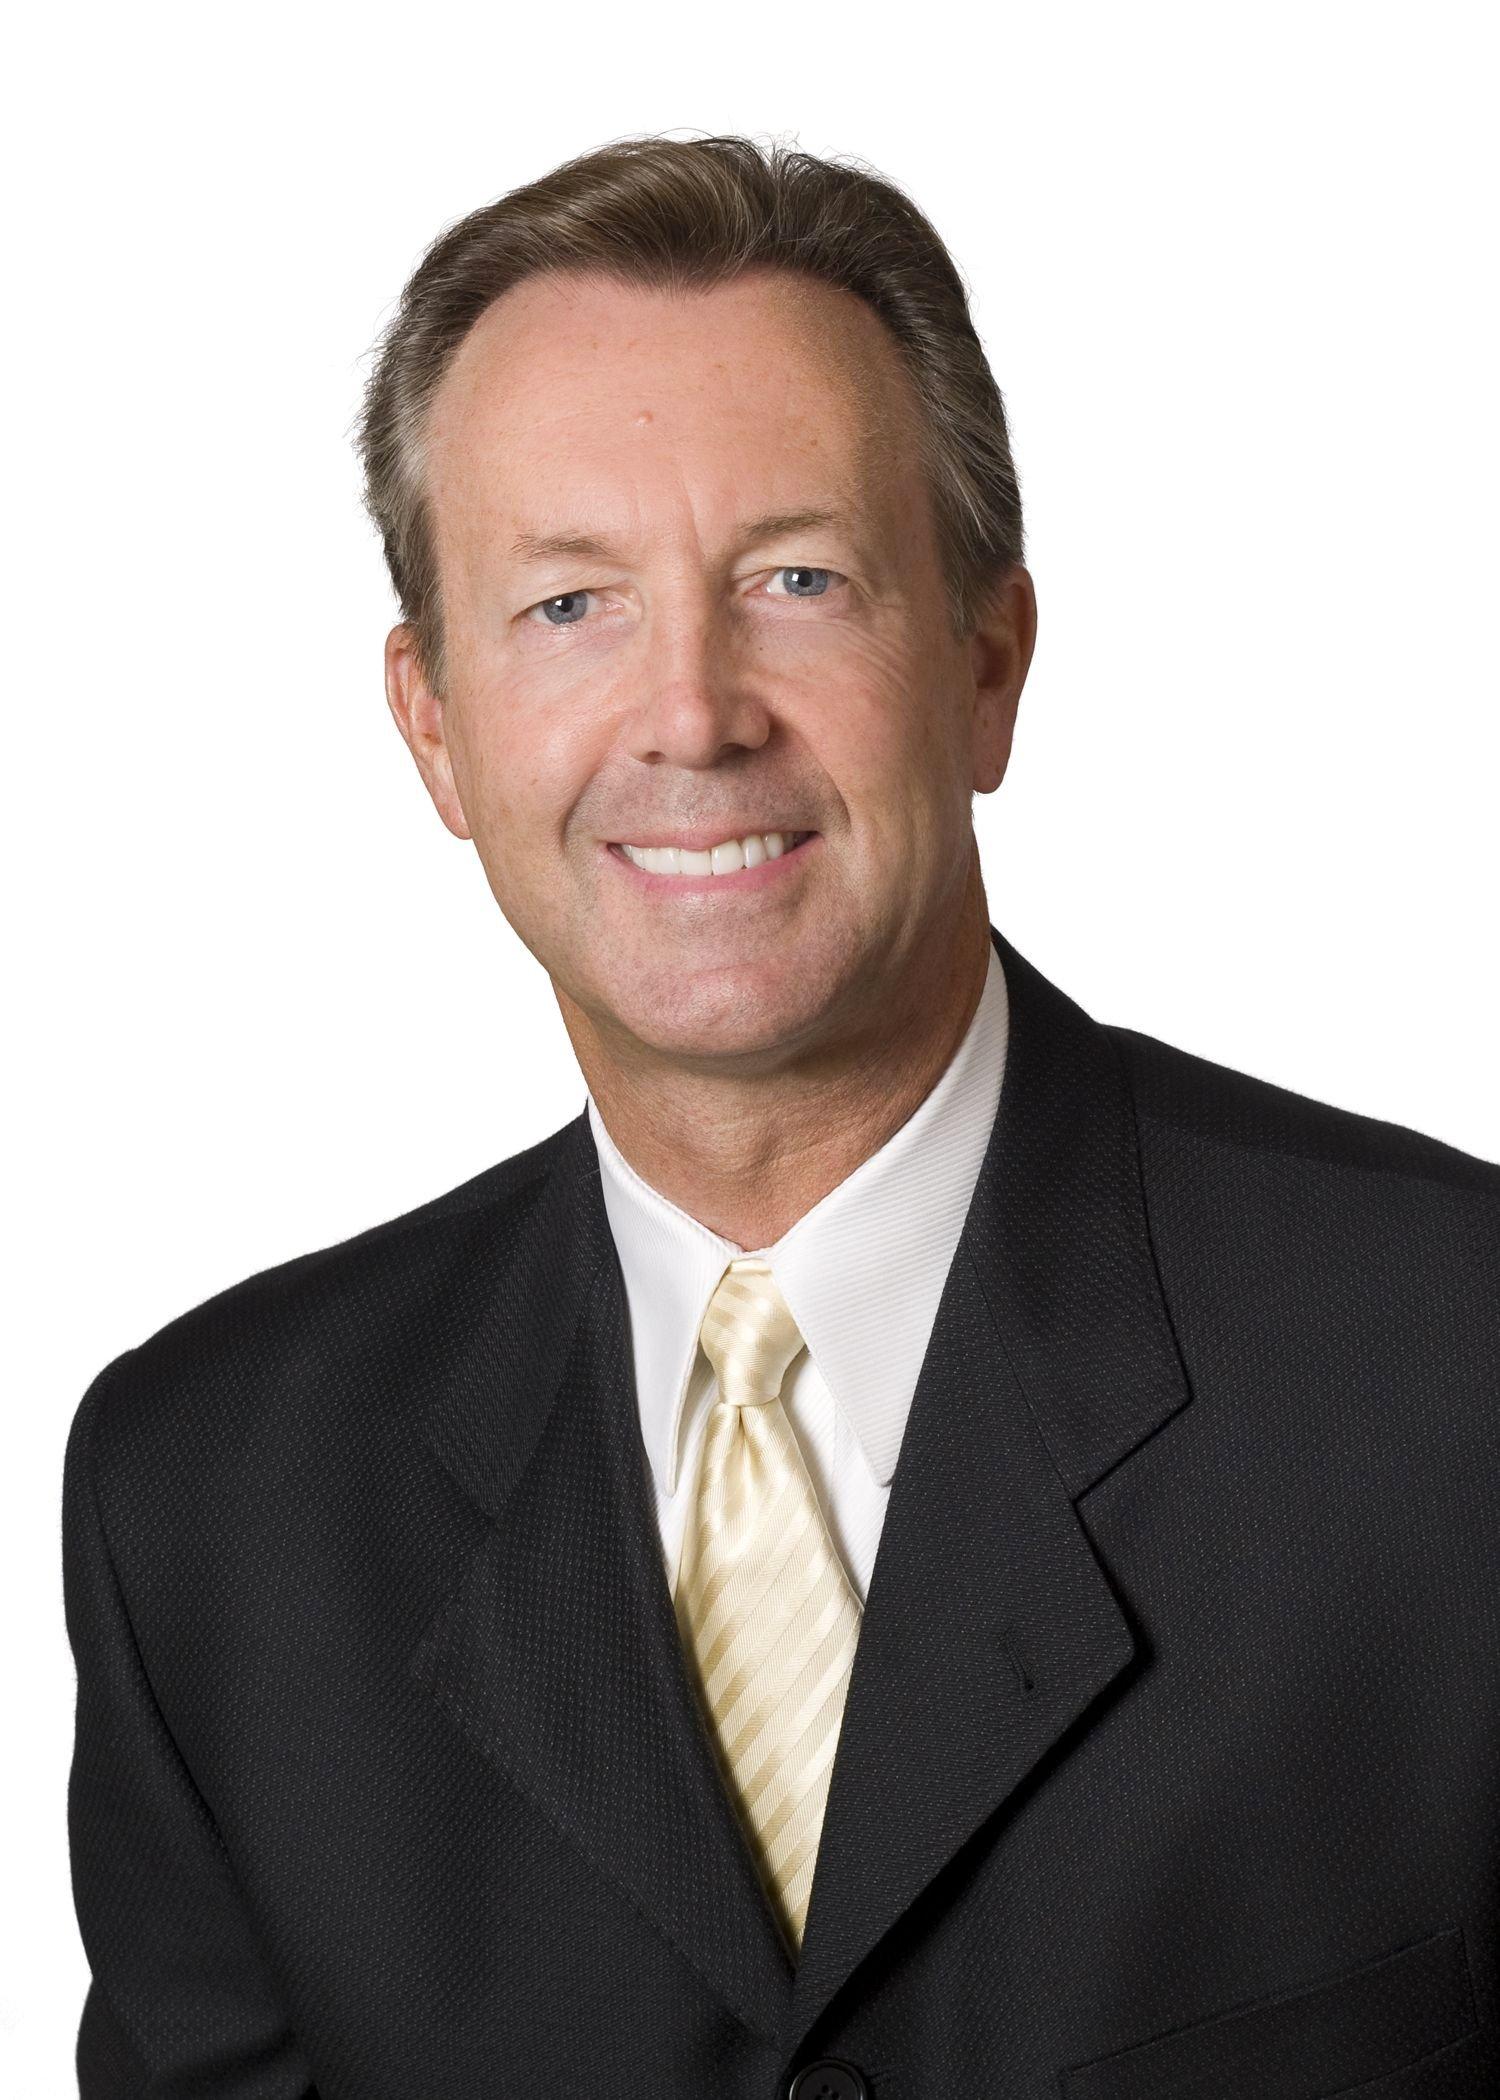 Bradley J. Olson